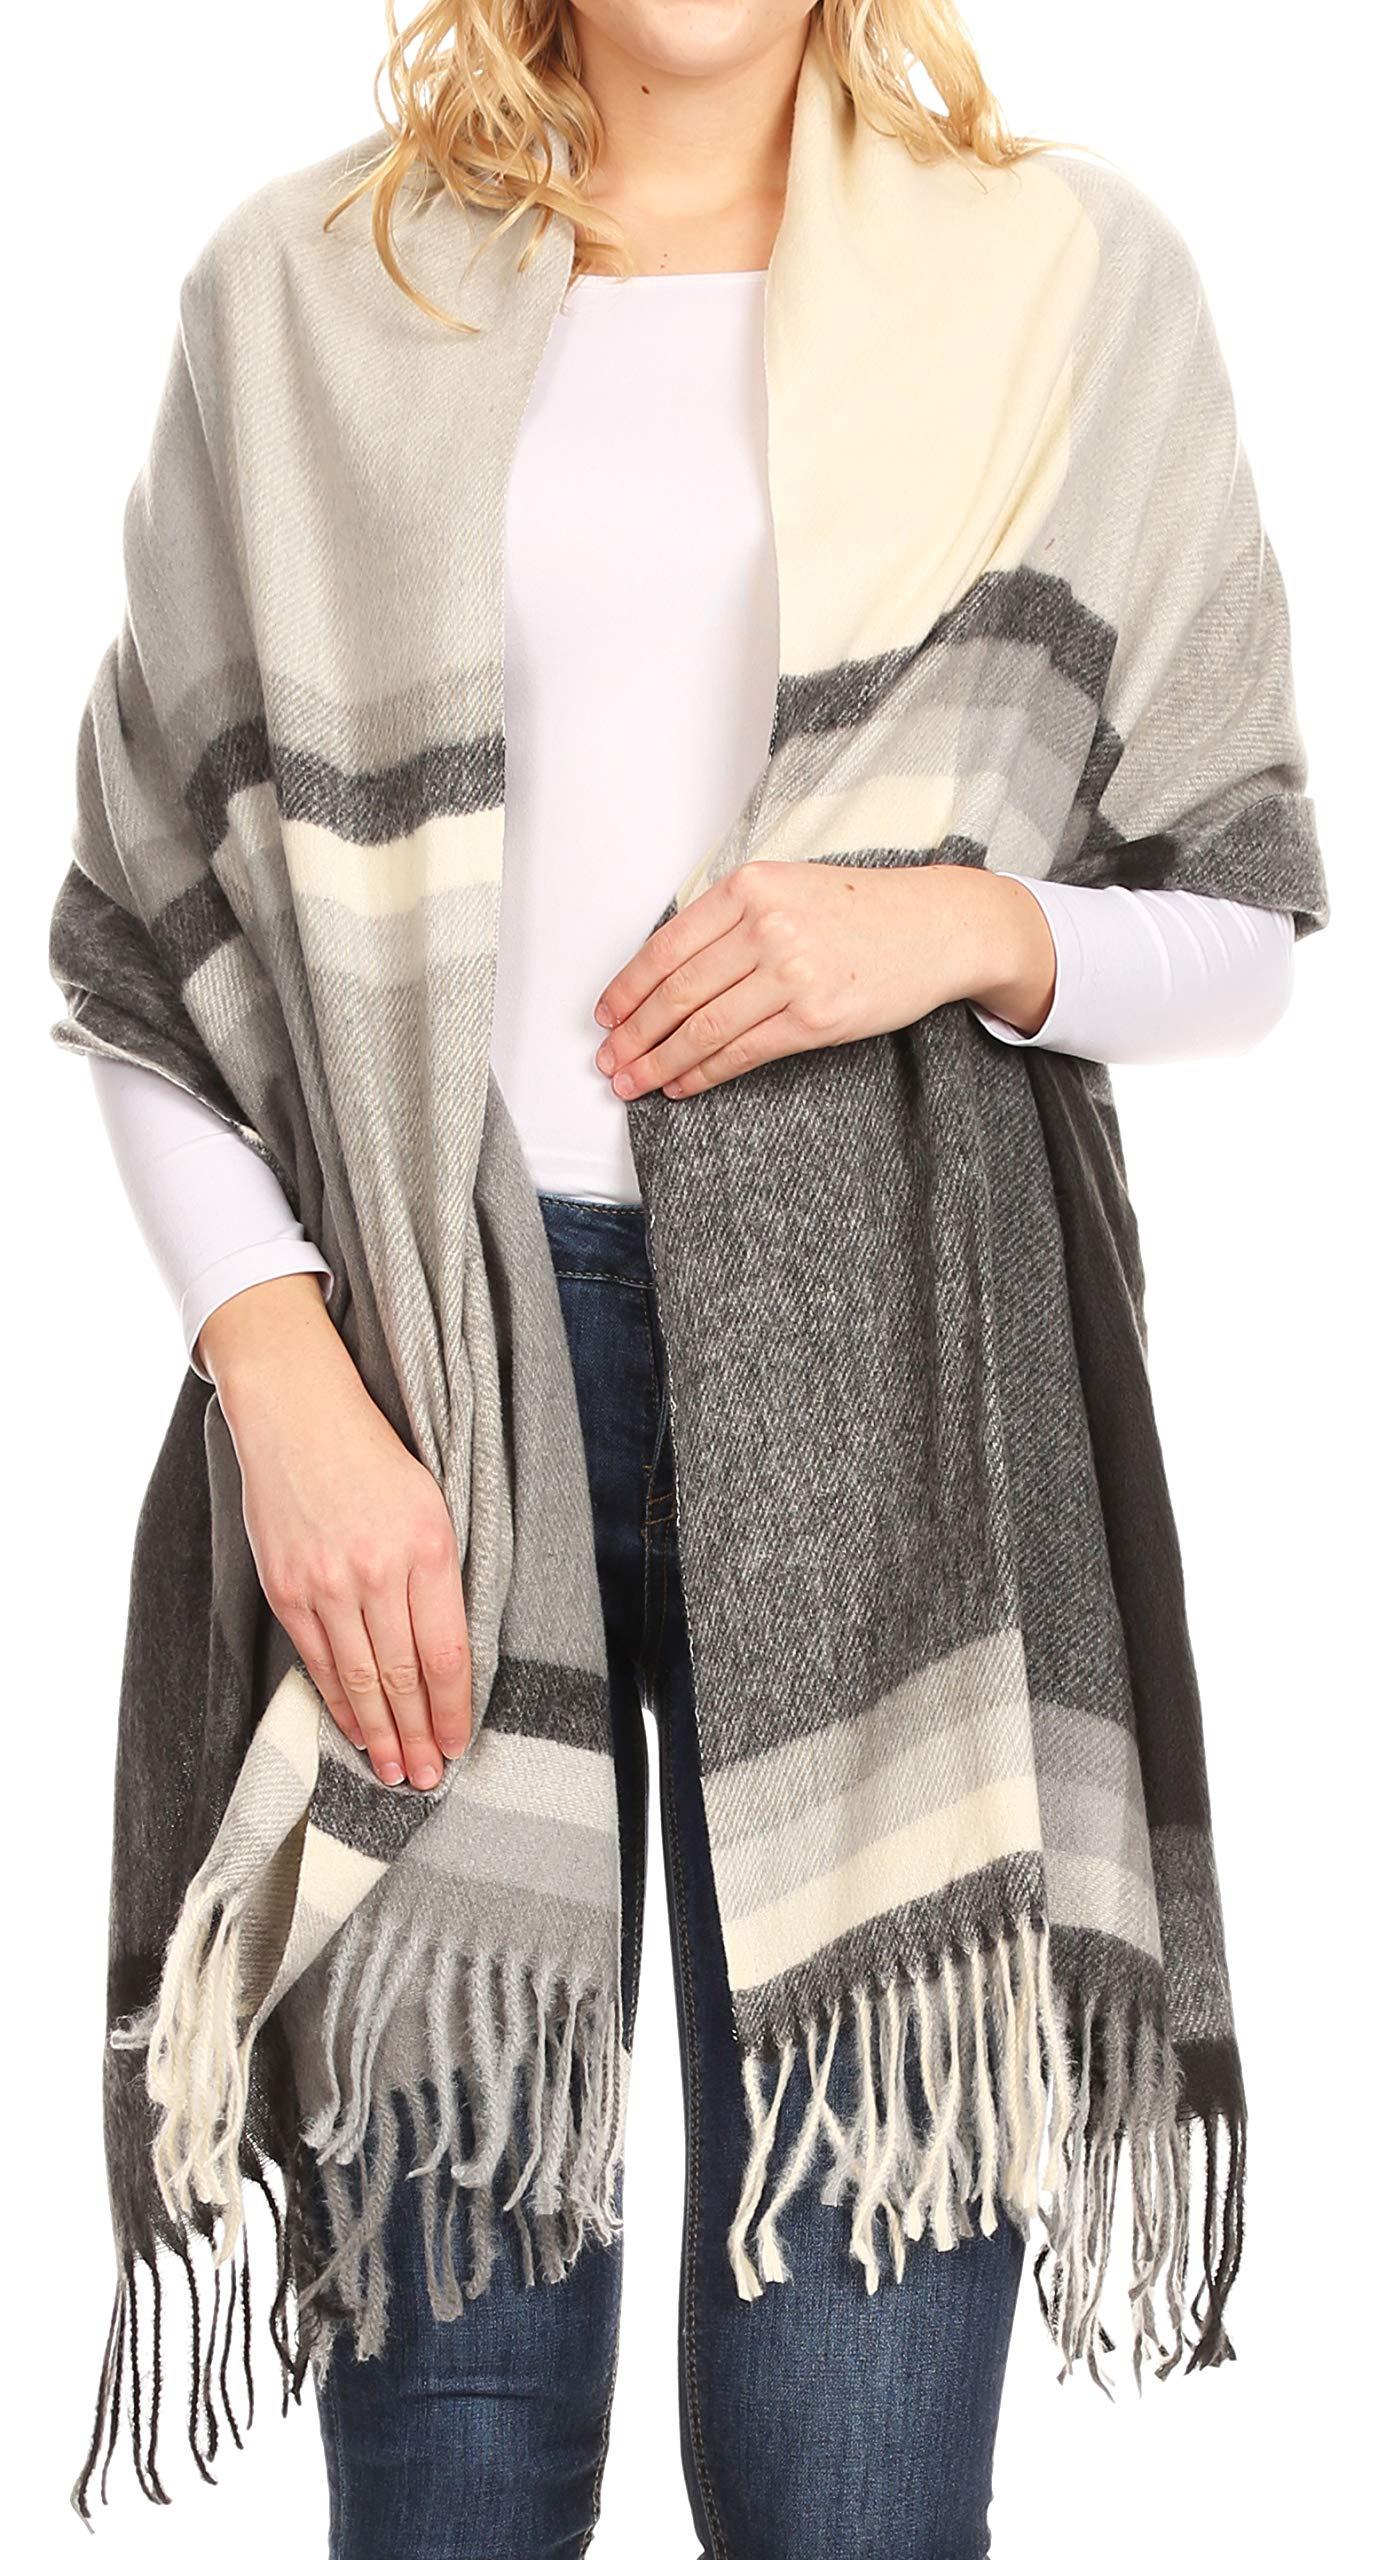 Sakkas Martinna Women's Winter Warm Super Soft and Light Pattern Shawl Scarf Wrap